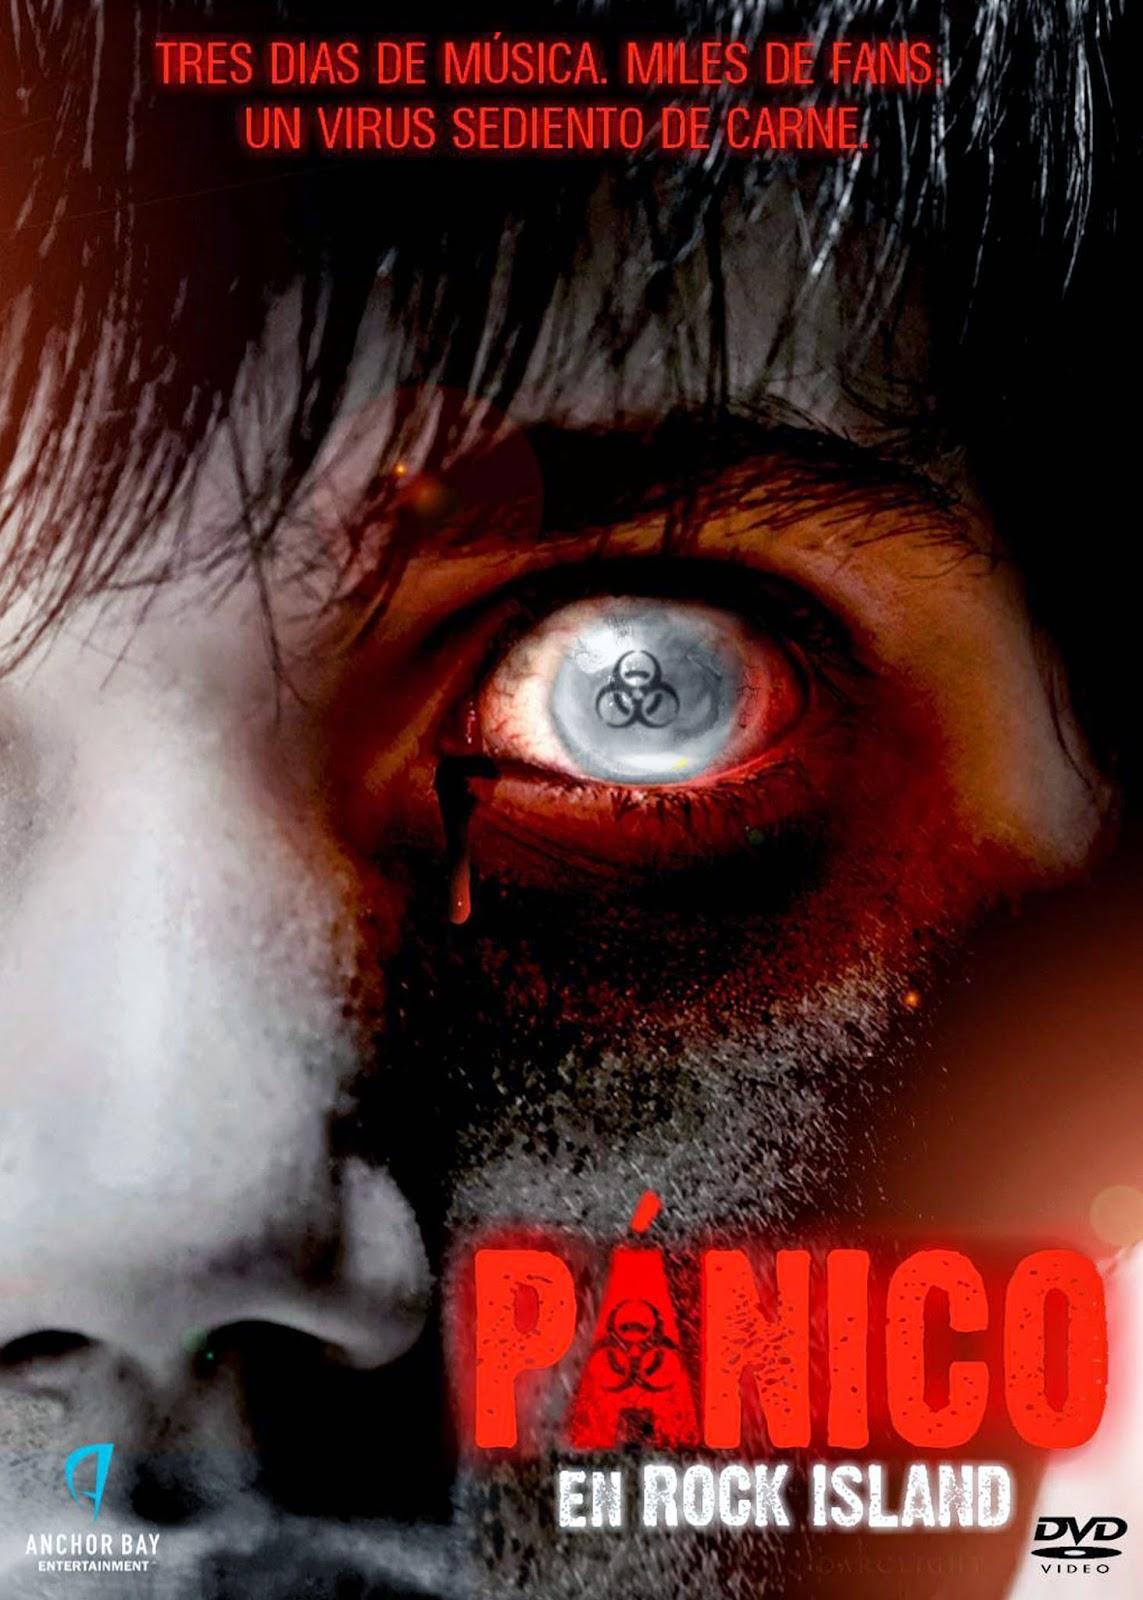 Pánico en Rock Island (2011)